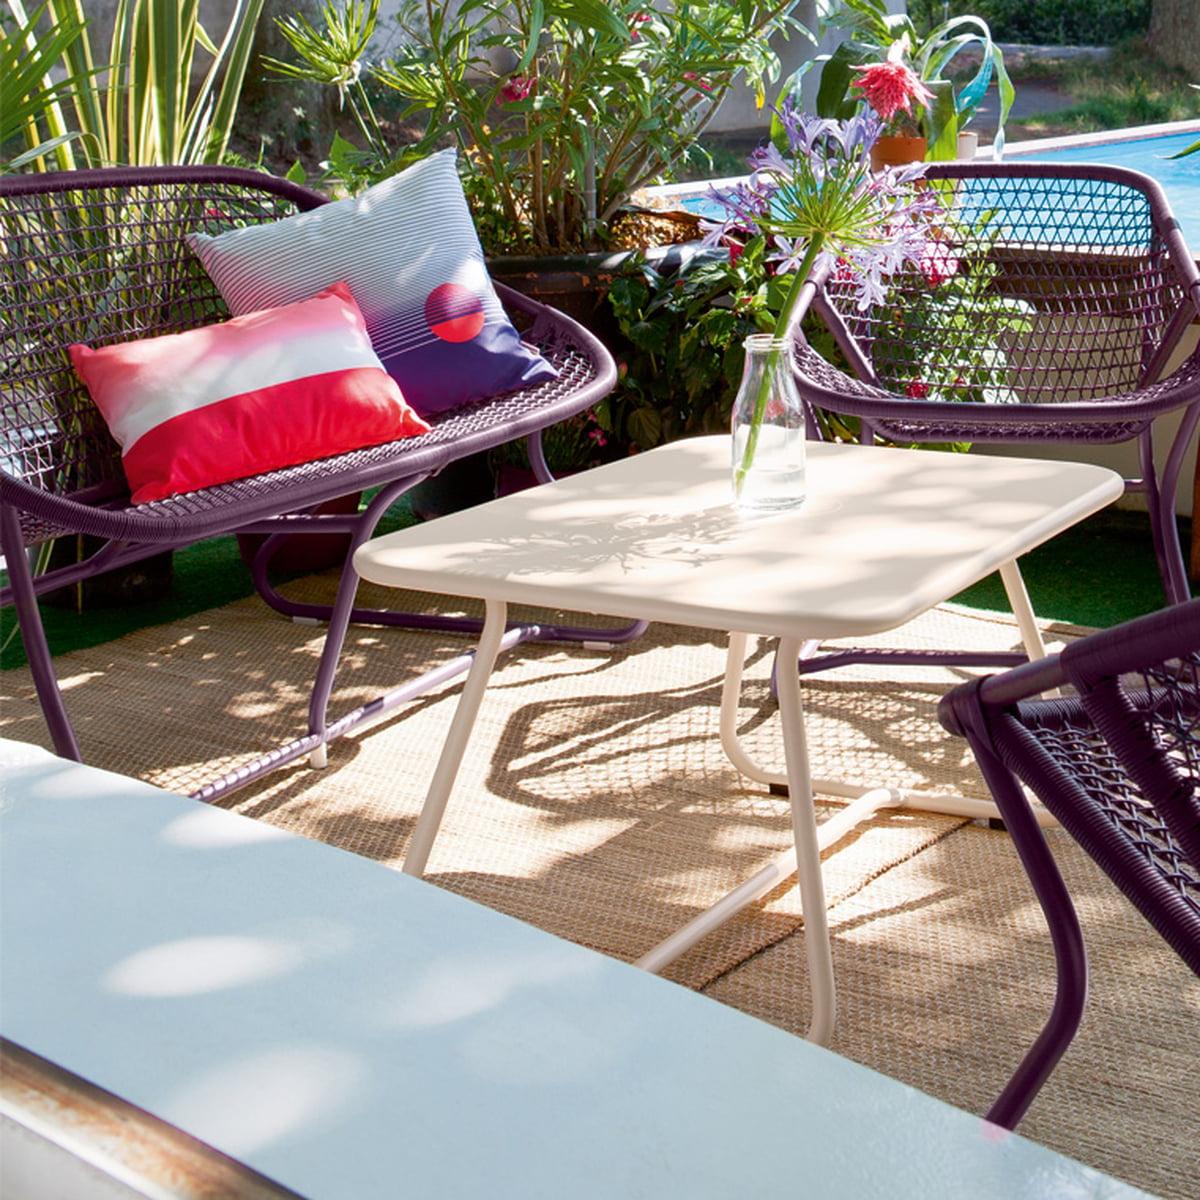 sixties bank von fermob im wohndesign shop. Black Bedroom Furniture Sets. Home Design Ideas